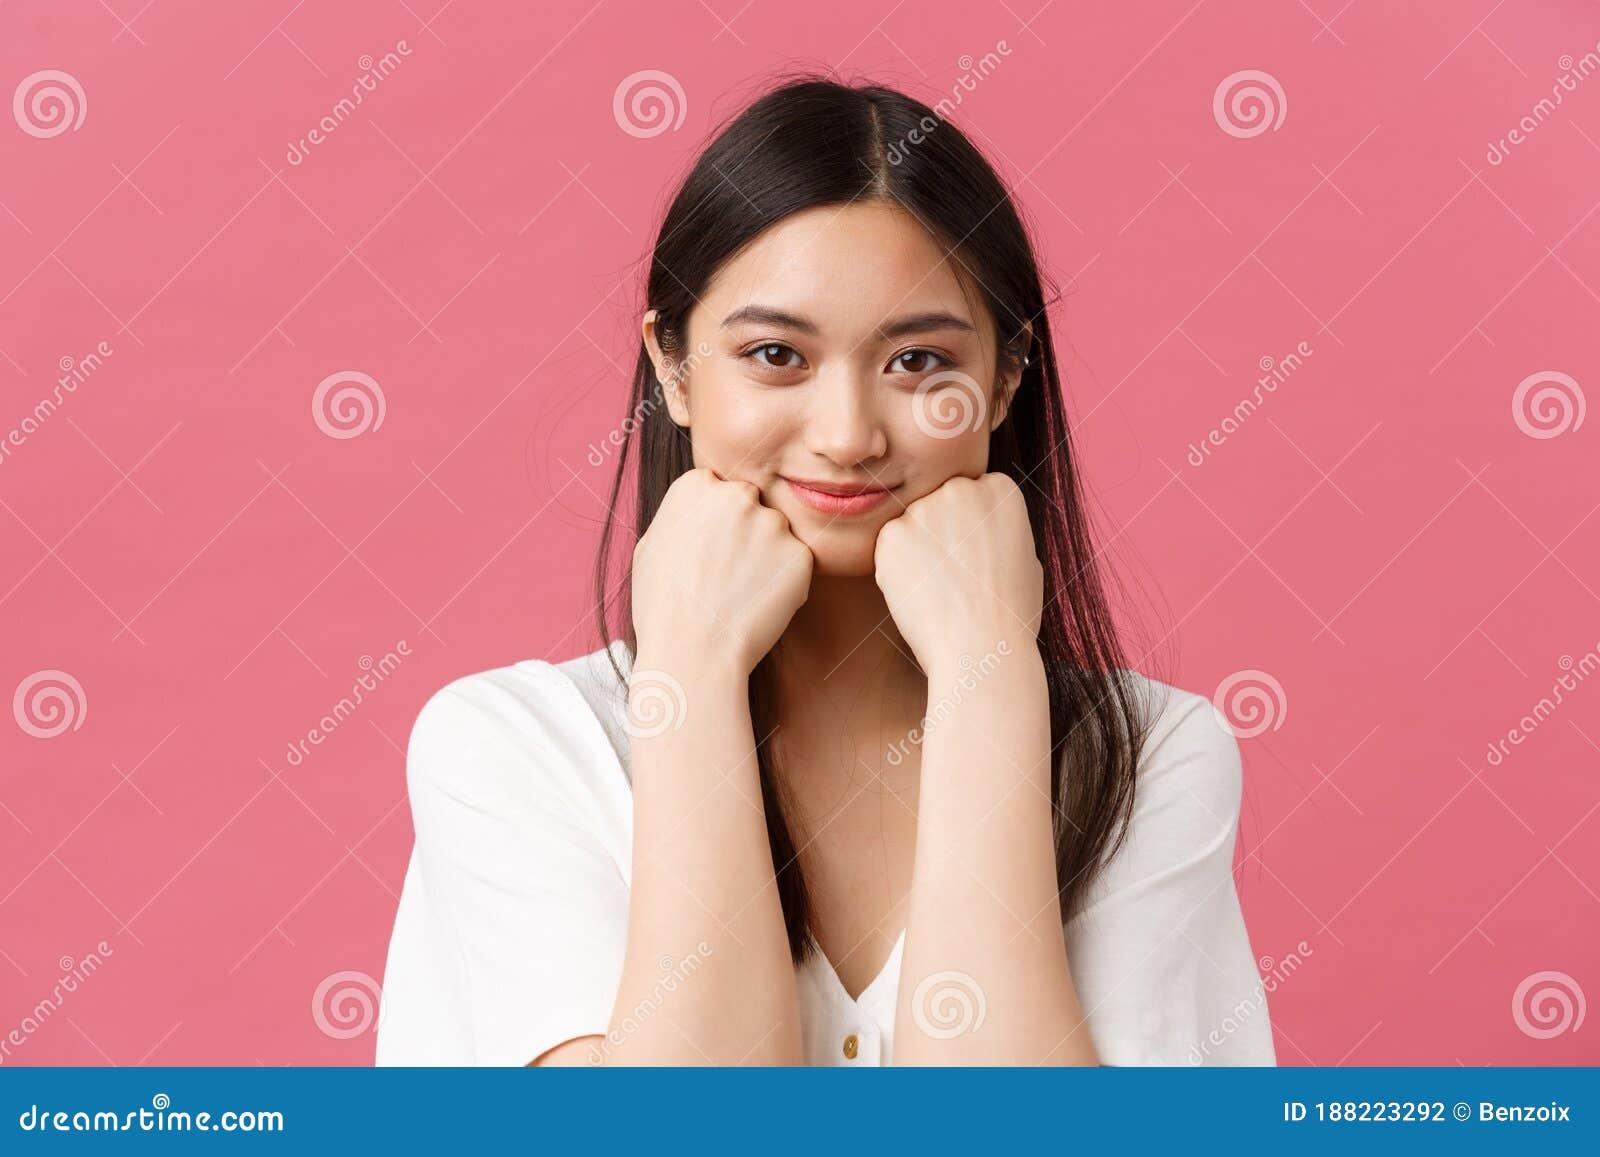 Cute Shy Girl Royalty Free Stock Photo - Image: 19870445